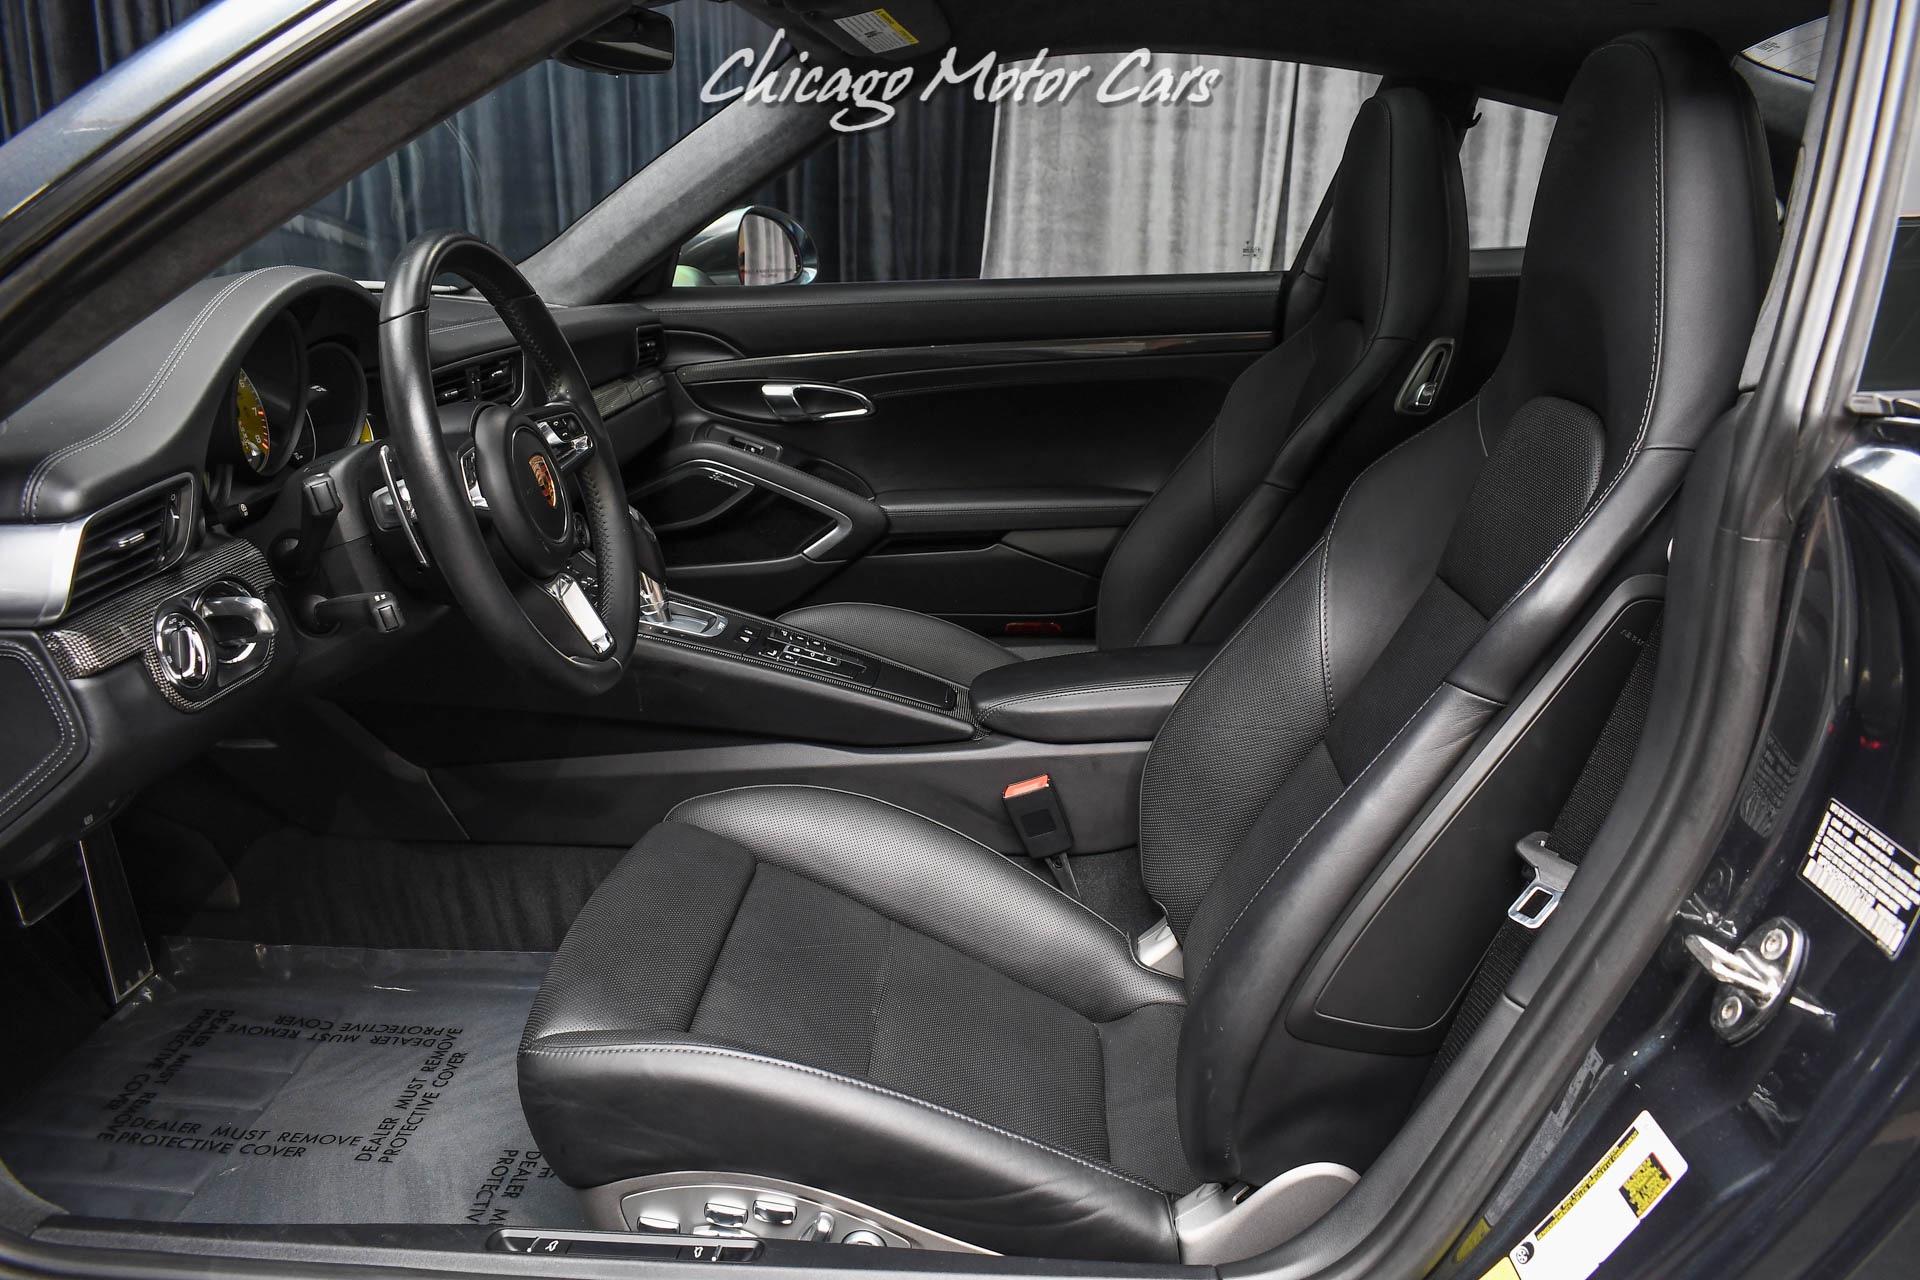 Used-2017-Porsche-911-Turbo-S-Coupe-PTS-Carbon-Steel-Gray-Metallic-Aerokit-Capristo-21-ANRKY-Wheels